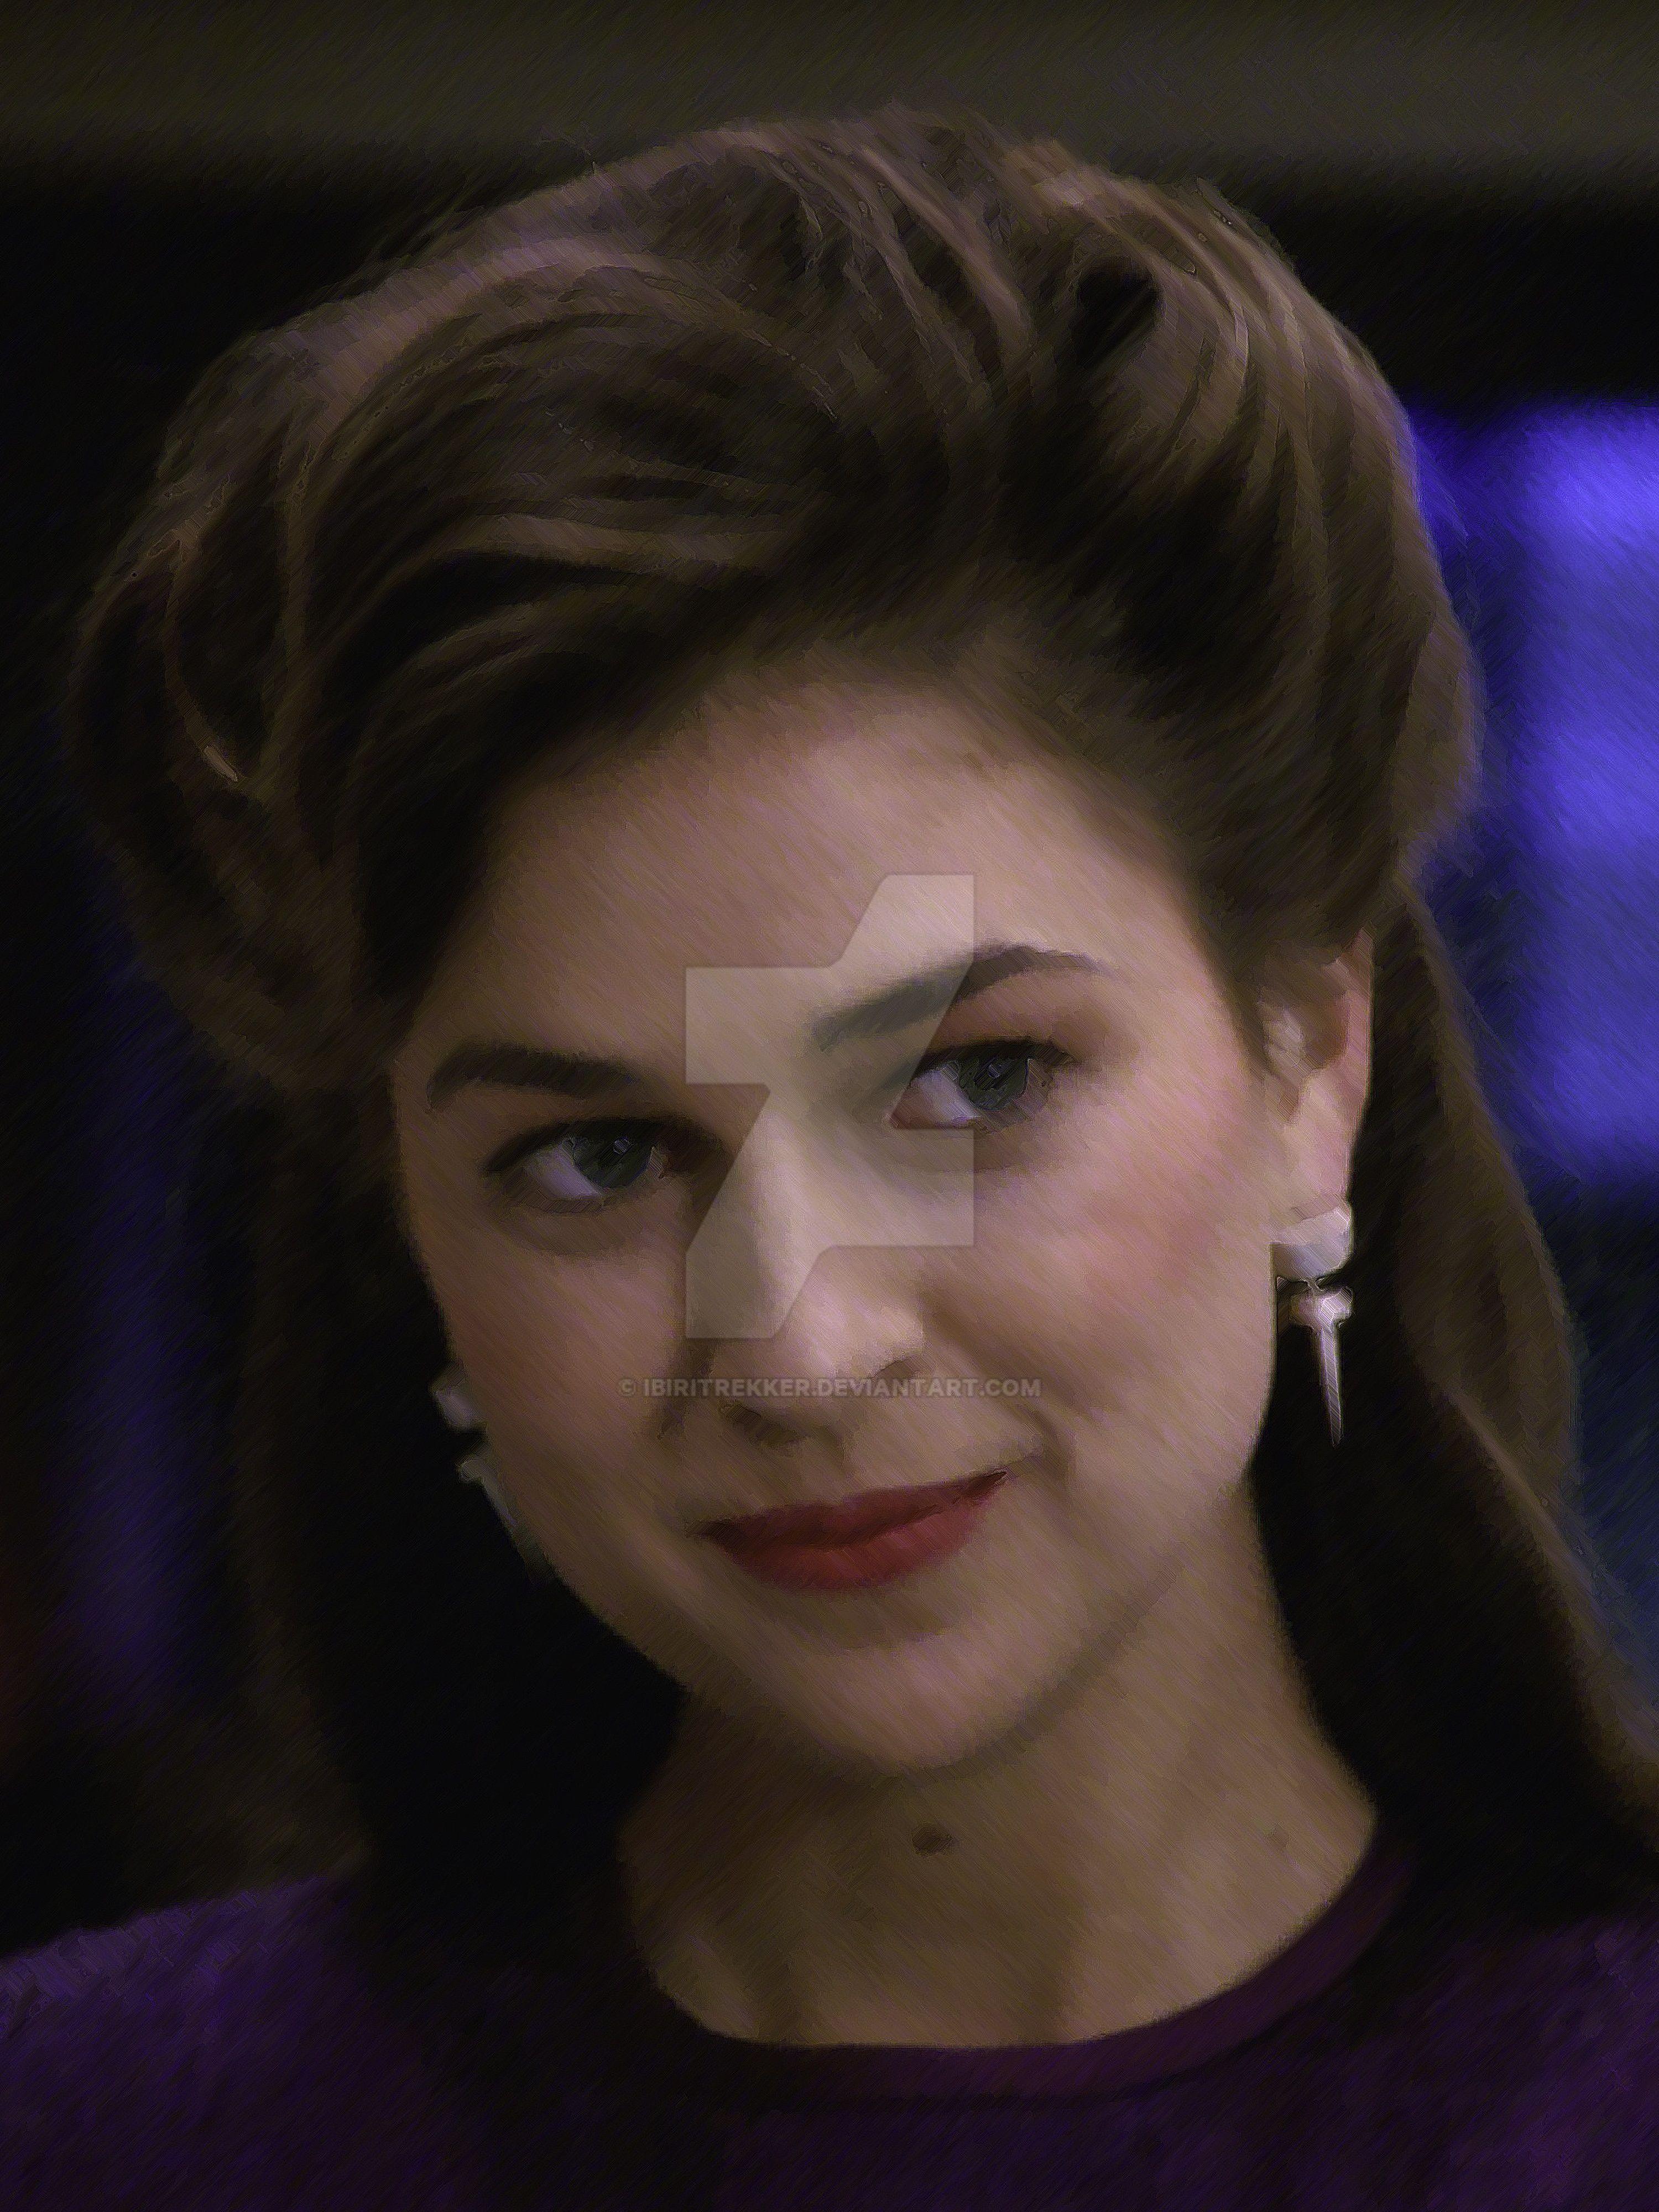 Star Trek TNG Leah Brahms by Ibiritrekker on DeviantArt